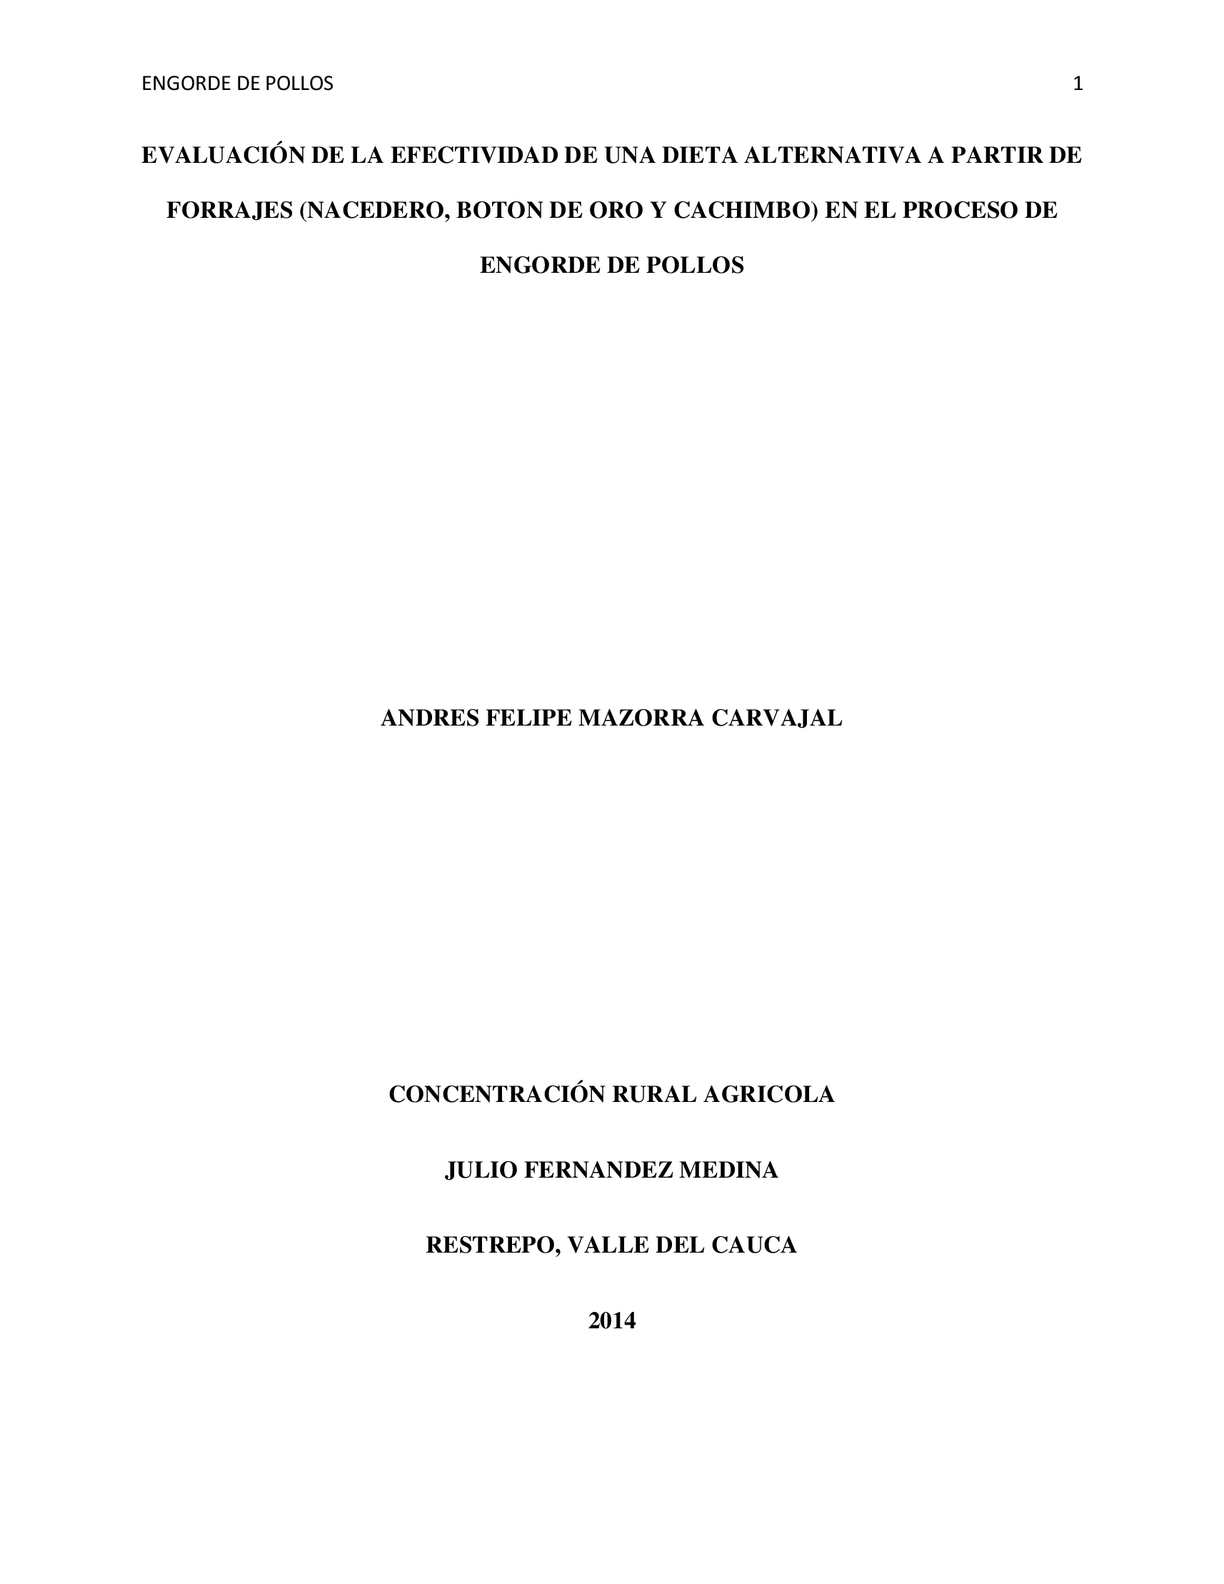 Calaméo - DIETA ALTERNATIVA PARA POLLOS DE ENGORDE